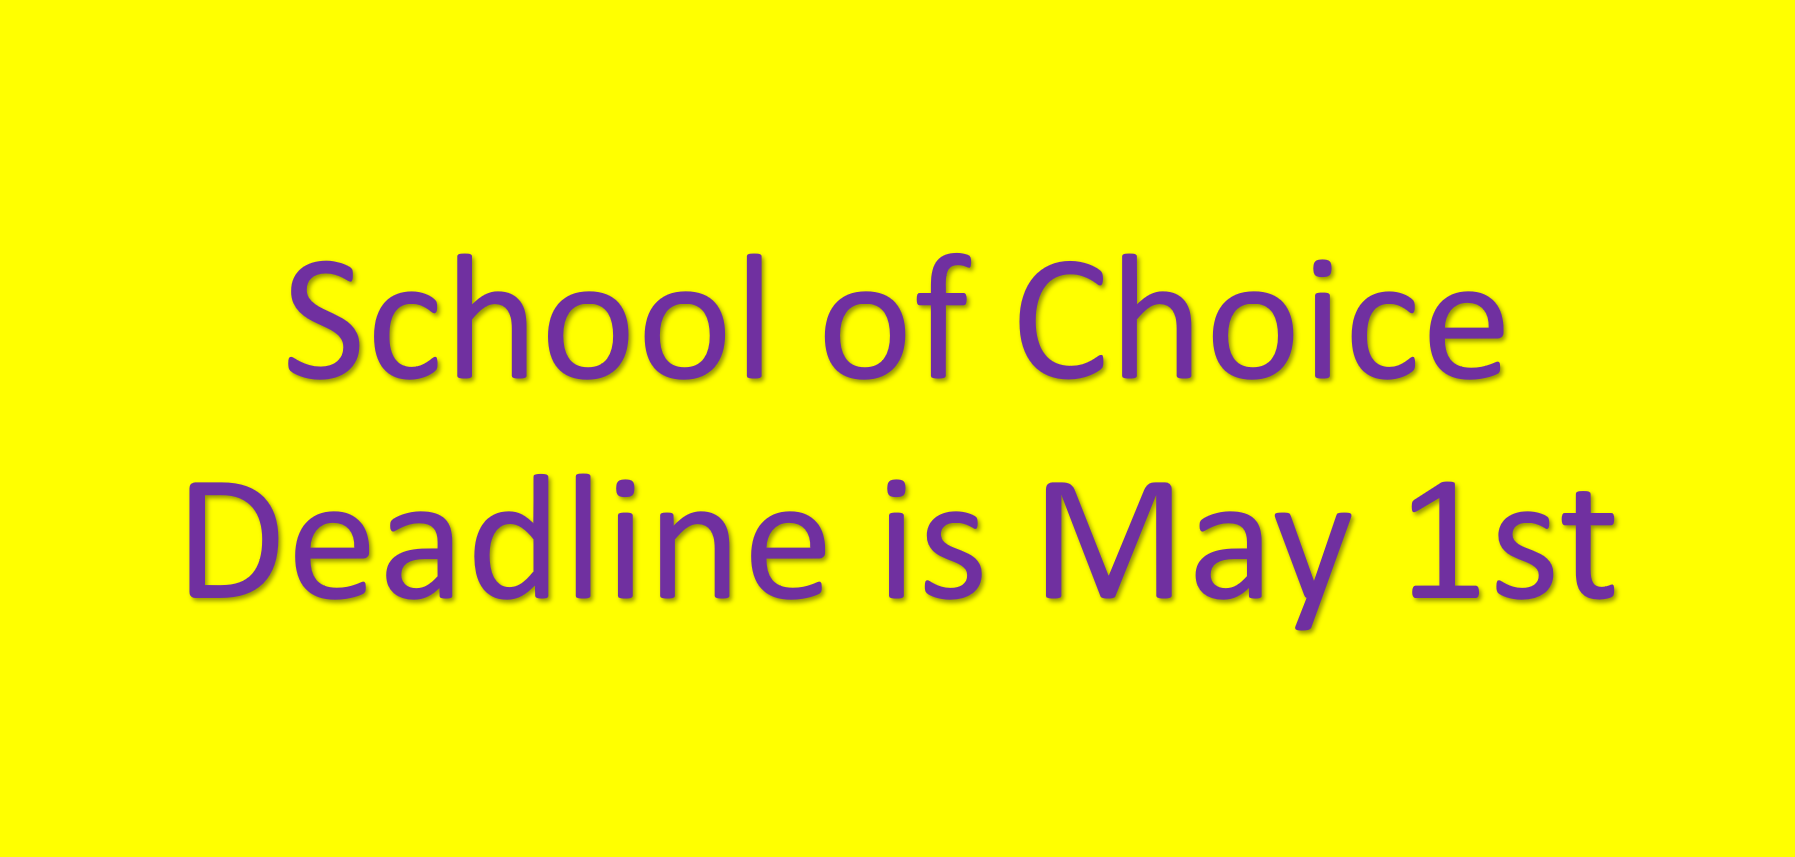 School of Choice Deadline May 1st